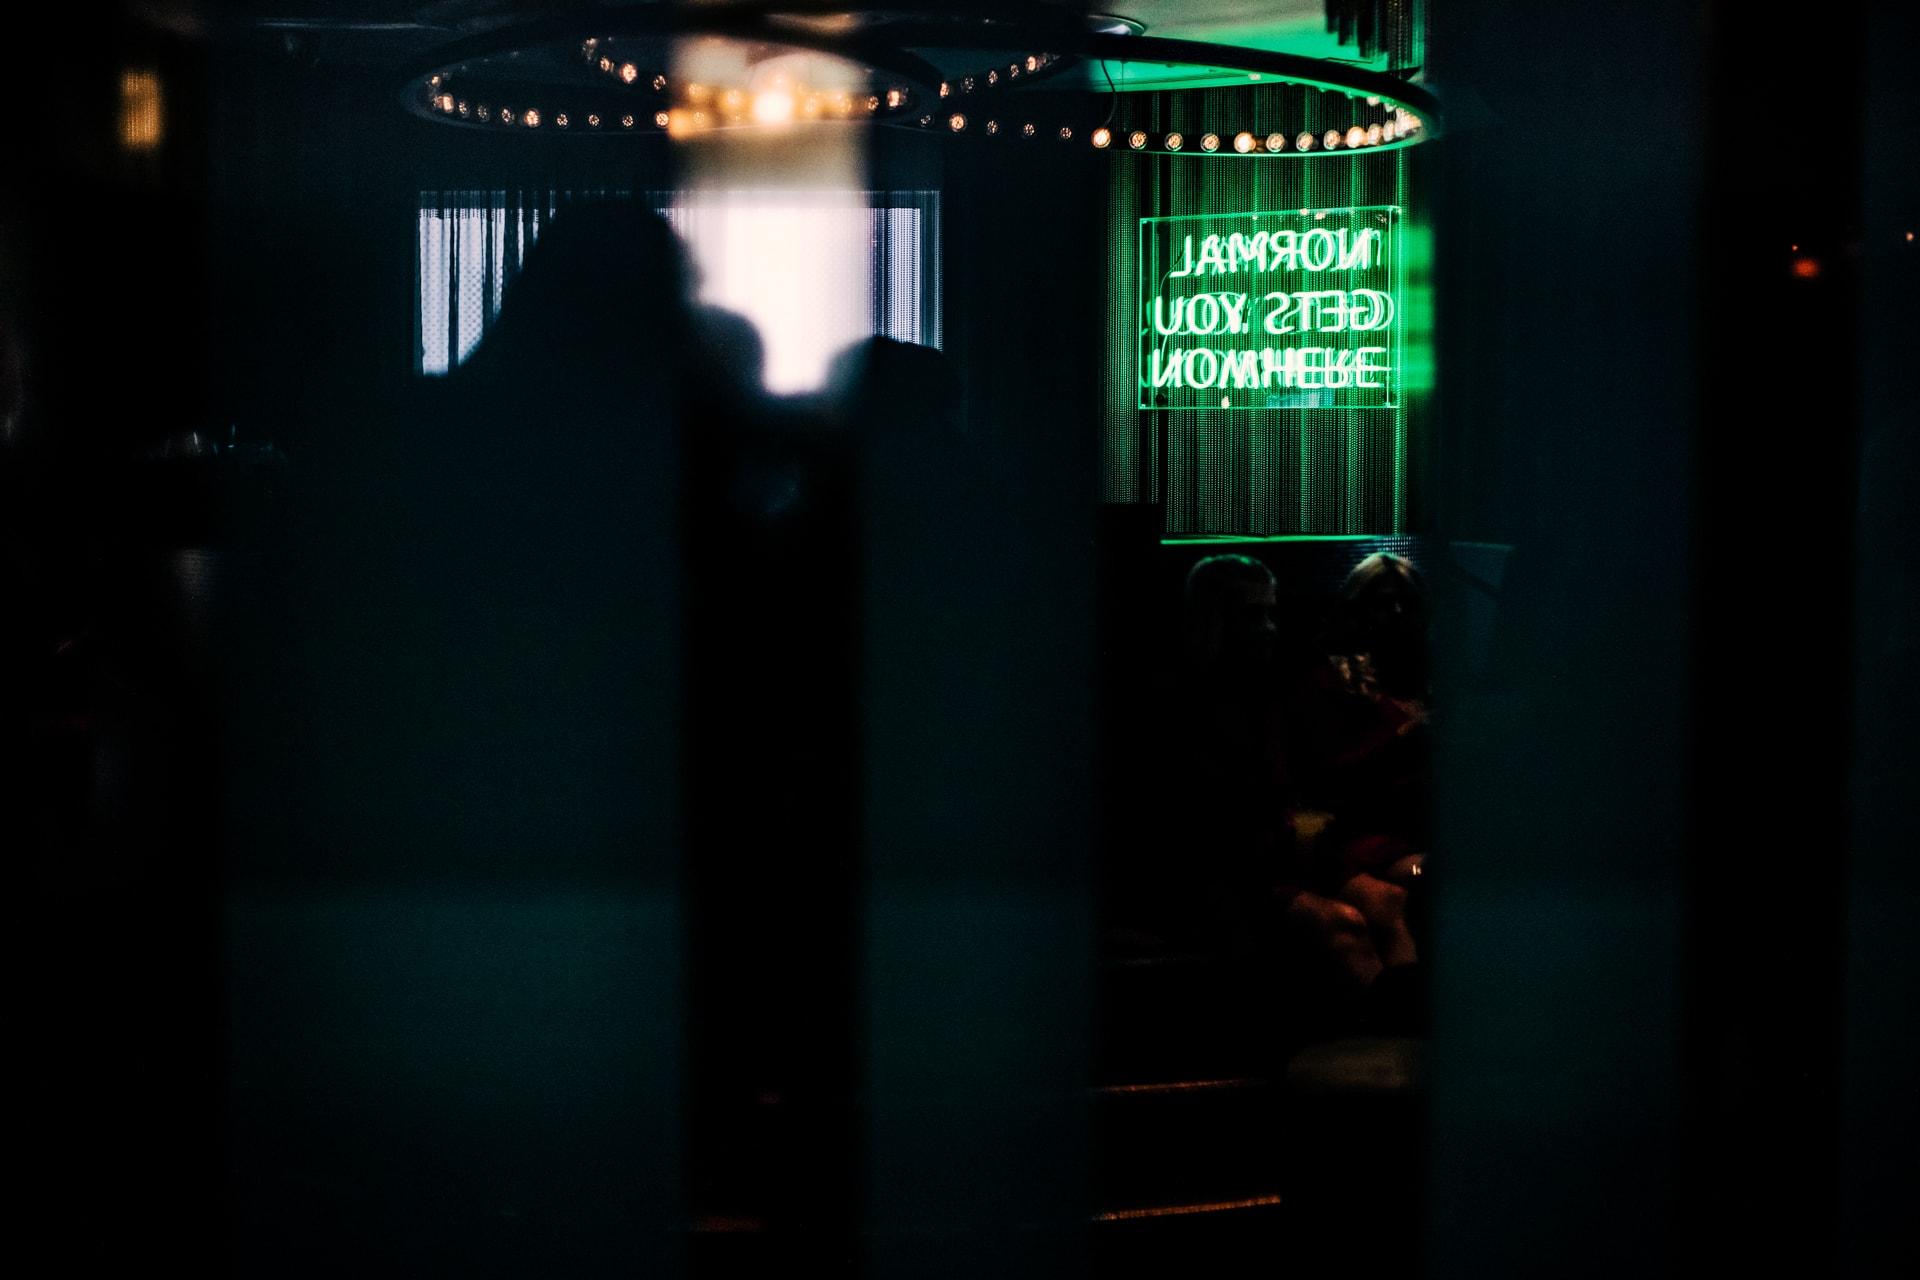 The W hotel London - The Perception Bar